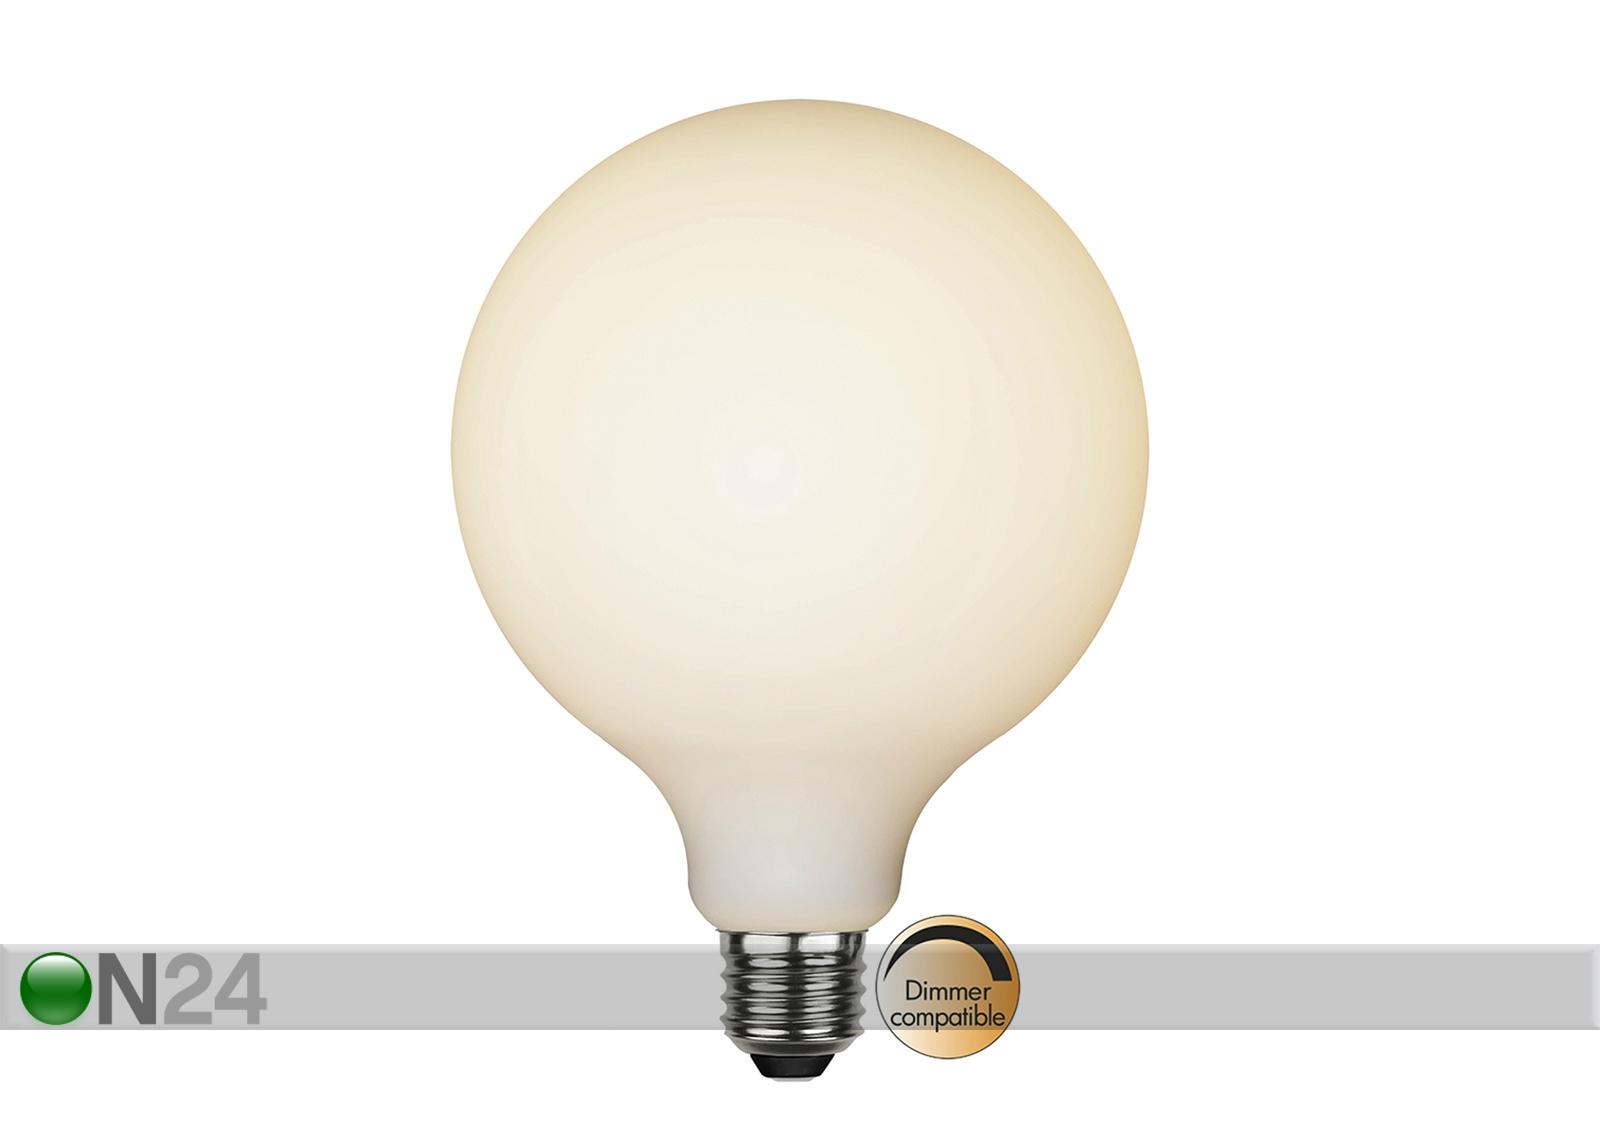 7e4230da6d4 Dekoratiivne LED pirn E27 5 W AA-152777 - ON24 Sisustuskaubamaja